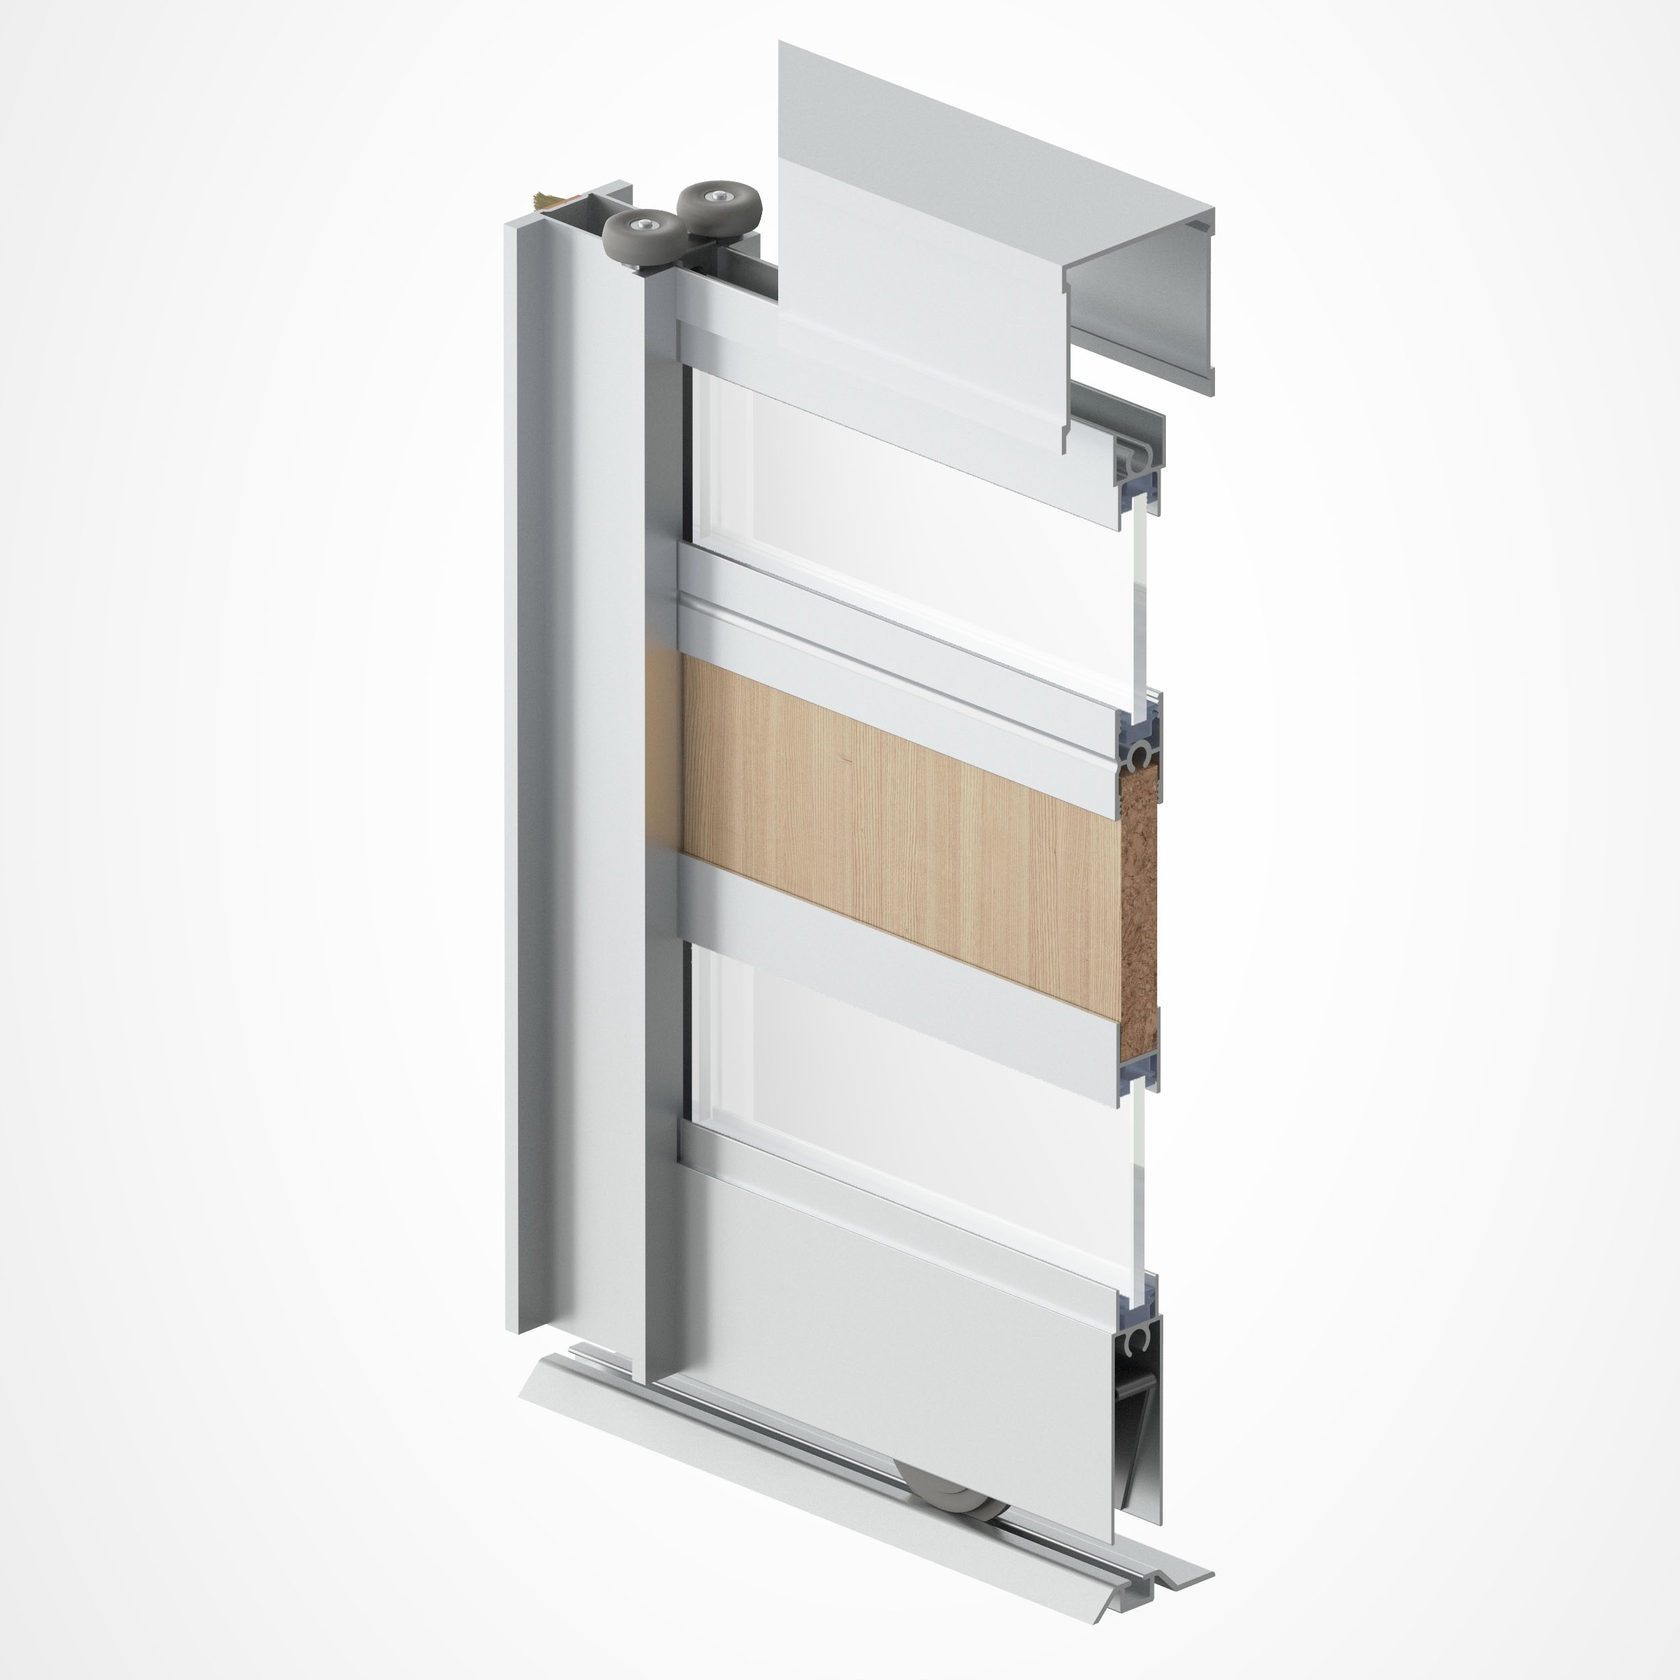 опорный механизм дверей шкафа